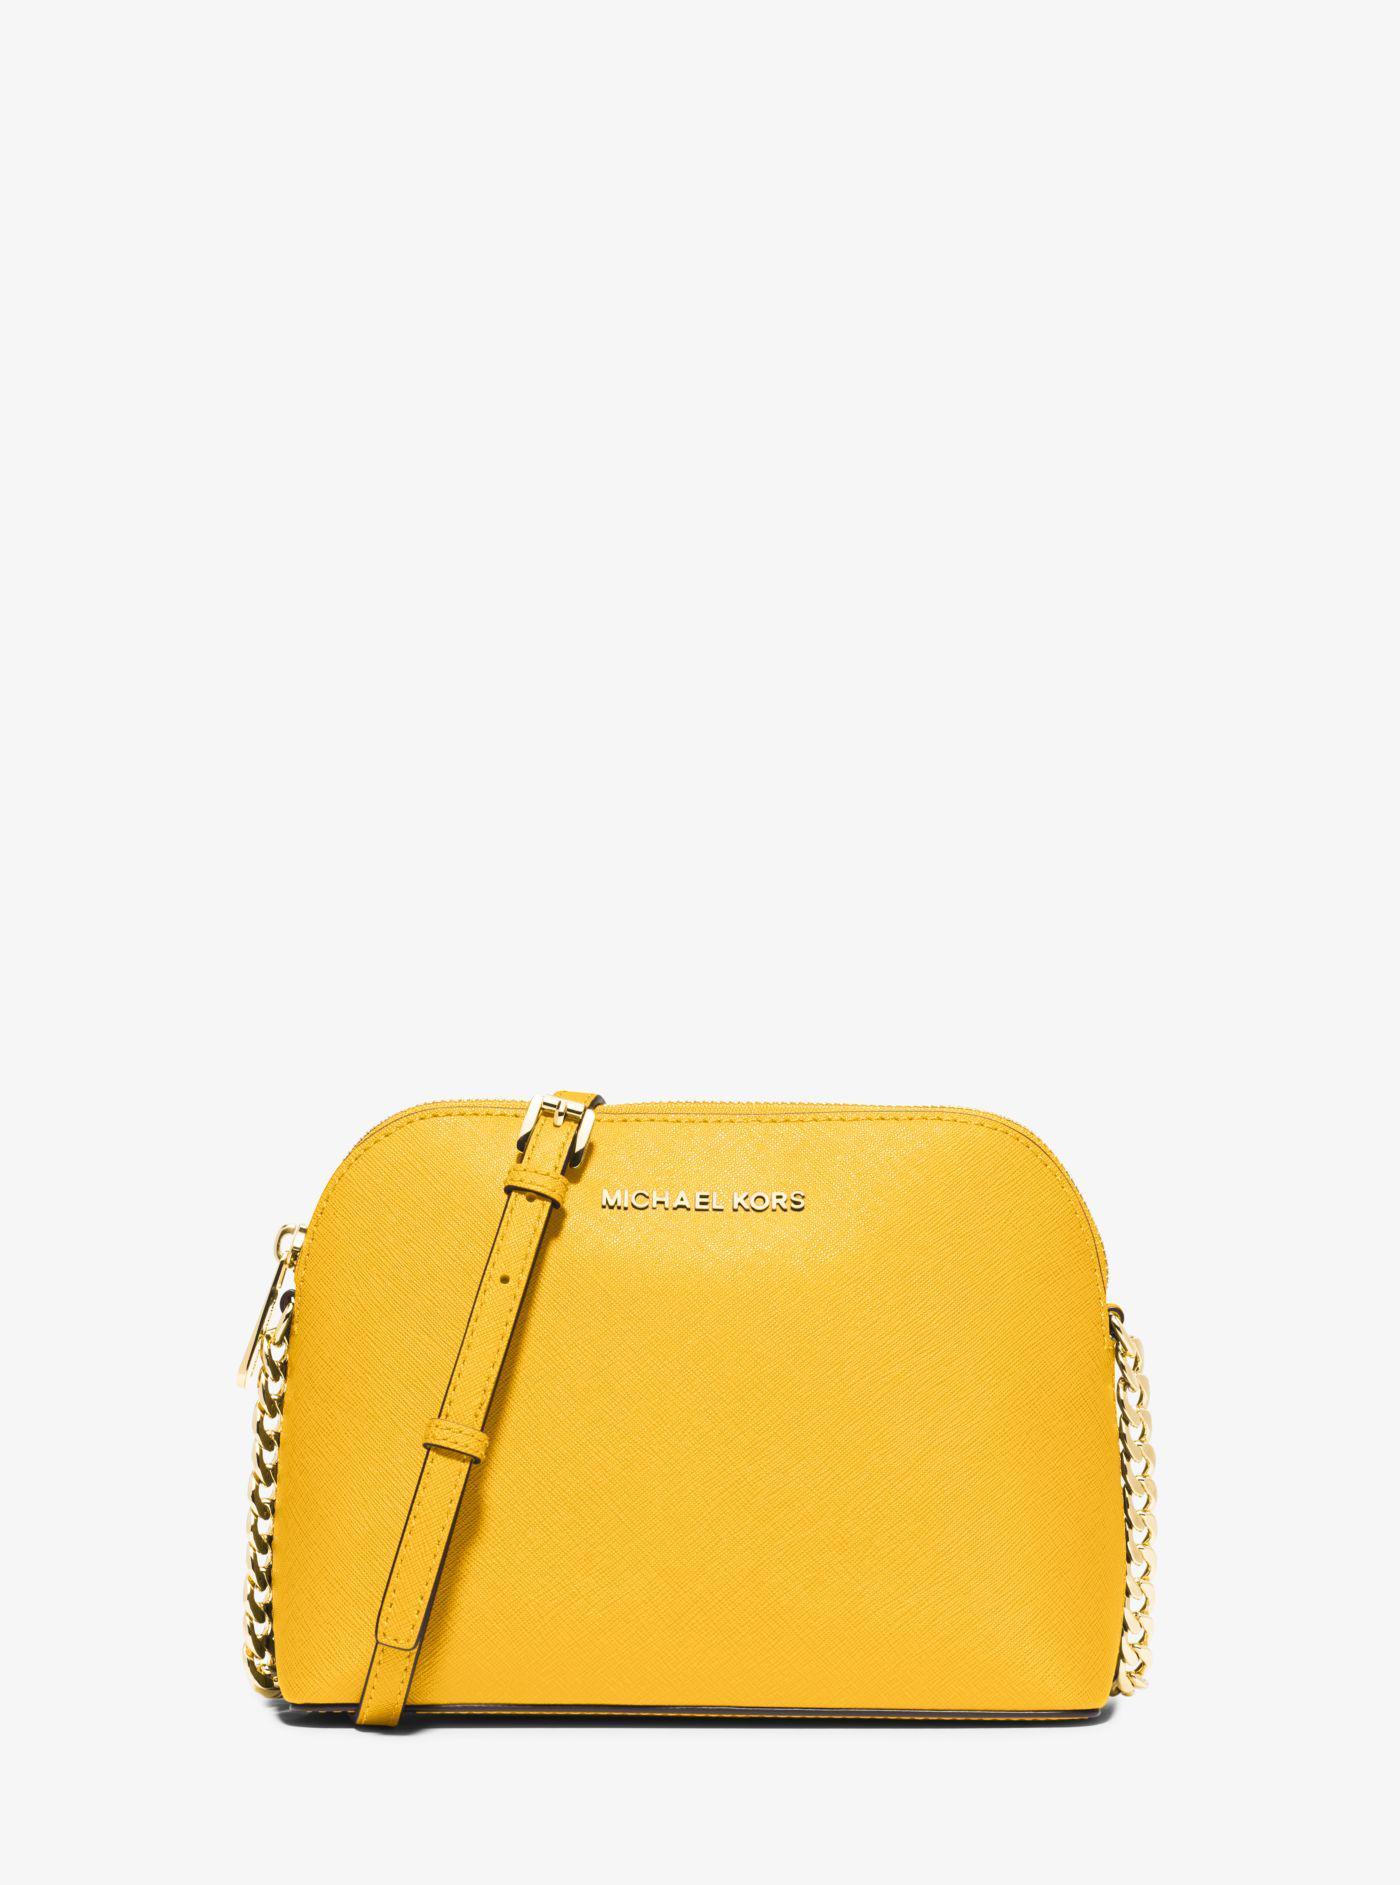 Womens Weekend Bags Womens Weekender Bags Womens Michael Kors Cindy huge  selection of e869b ... 5a143e5ce8